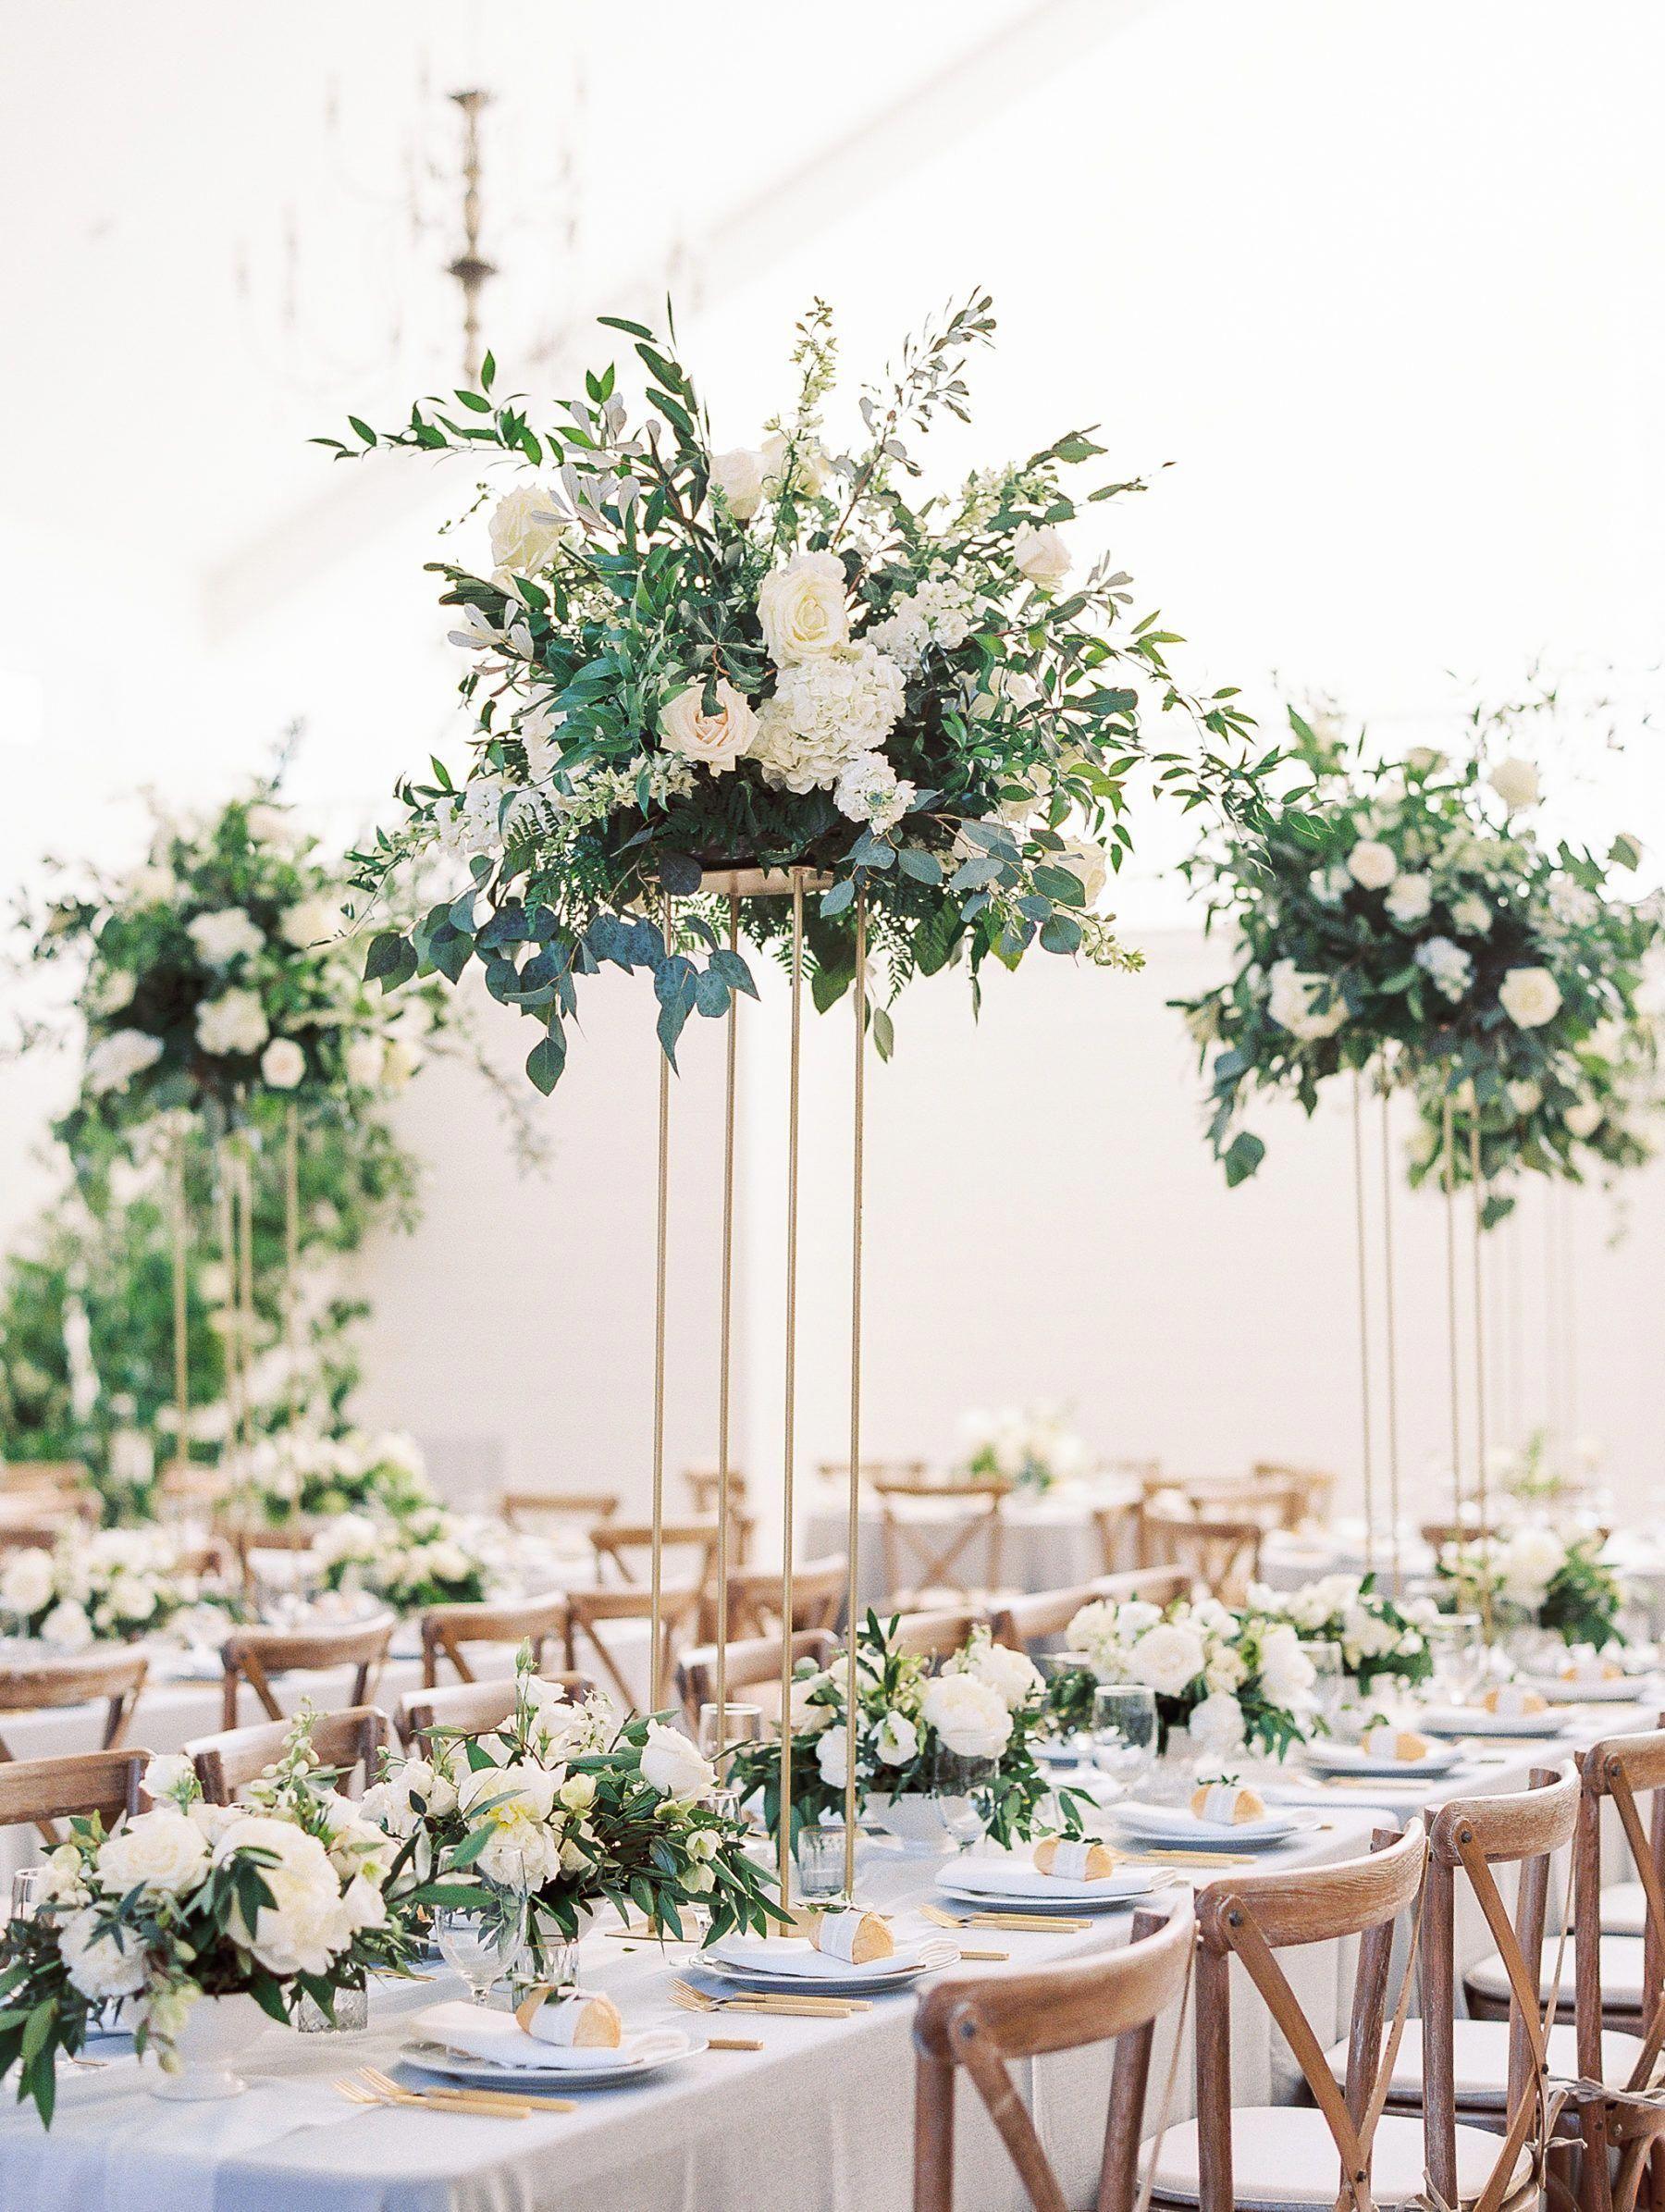 The Grandeur House Wedding With A Modern Farmhouse Style Gardenwedding Used Wedding Decor Unique Wedding Flowers Wedding Centerpieces